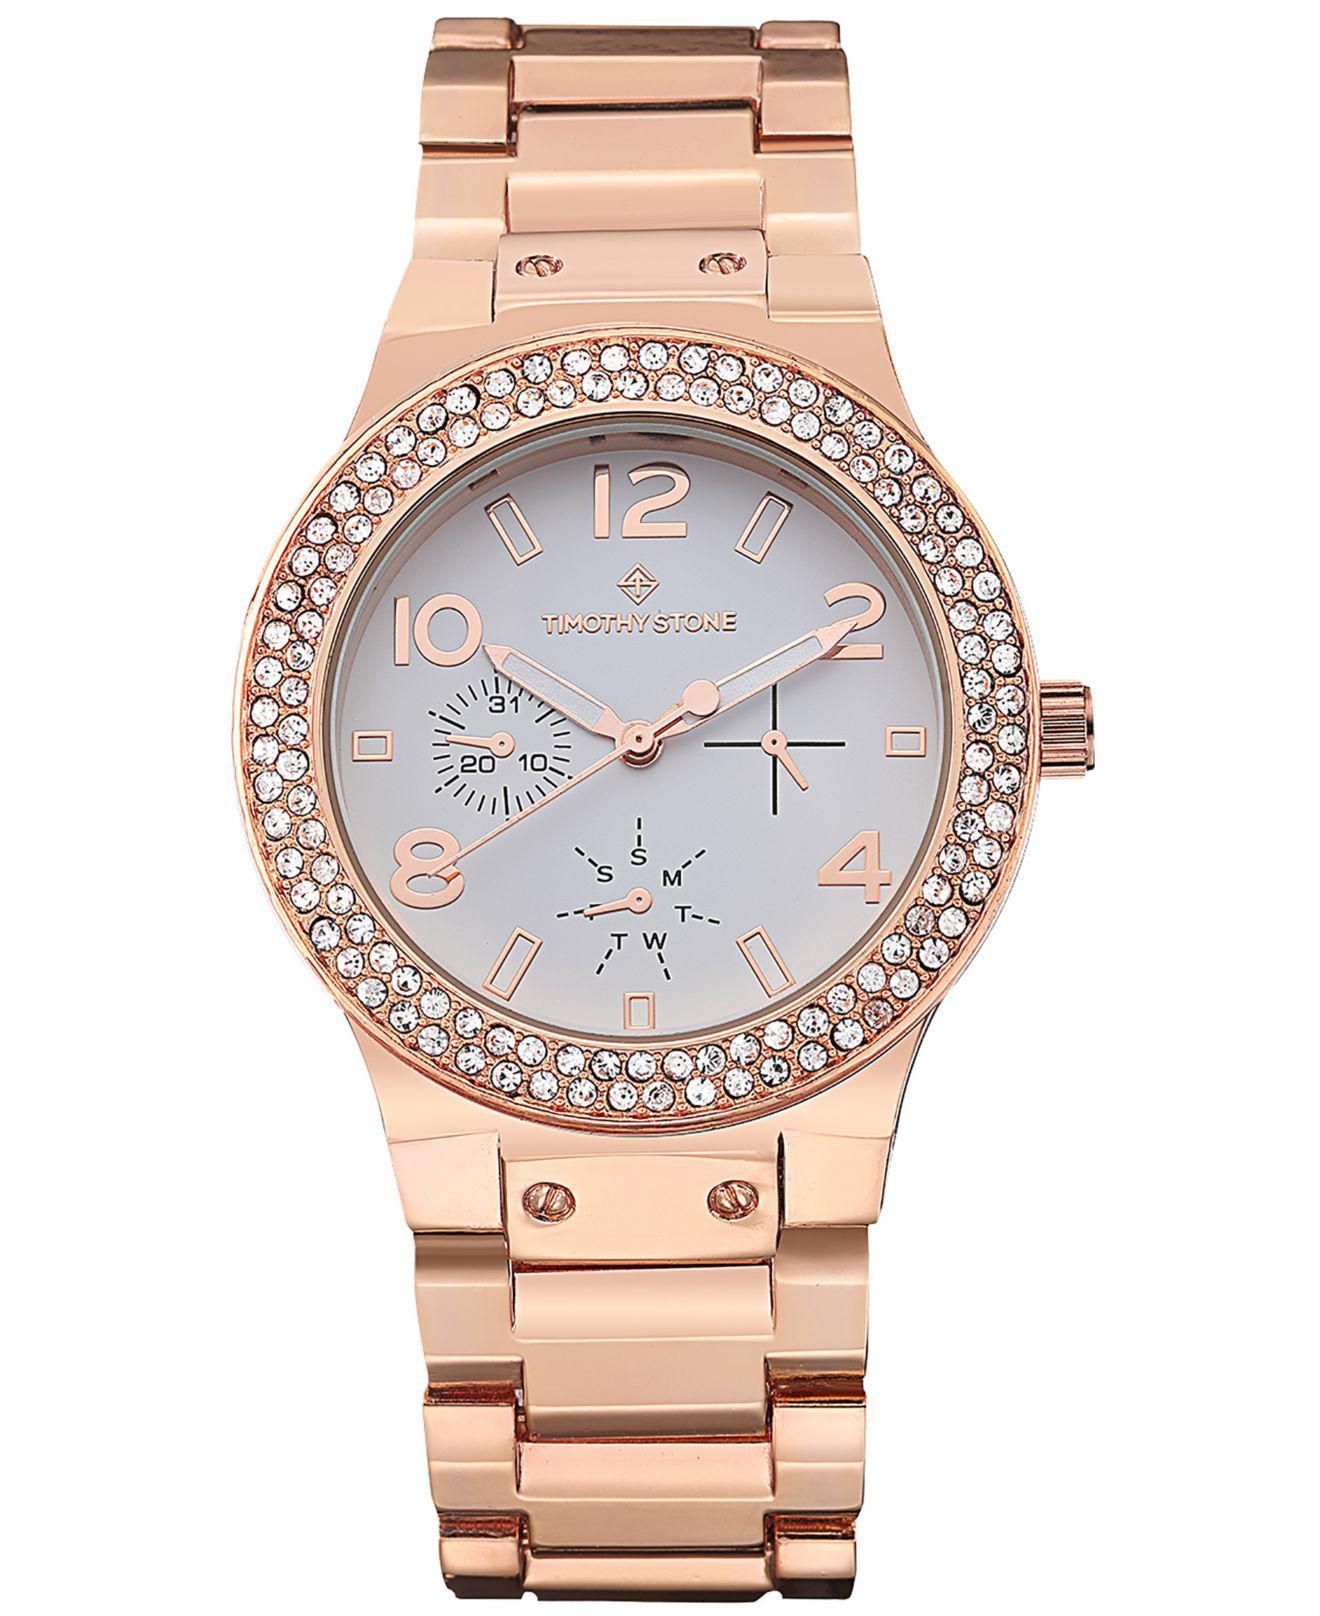 Lyst Timothy Stone Facon Crystal Bezel Boyfriend Watch In Pink Fossil Idealist Silver Es4194 View Fullscreen